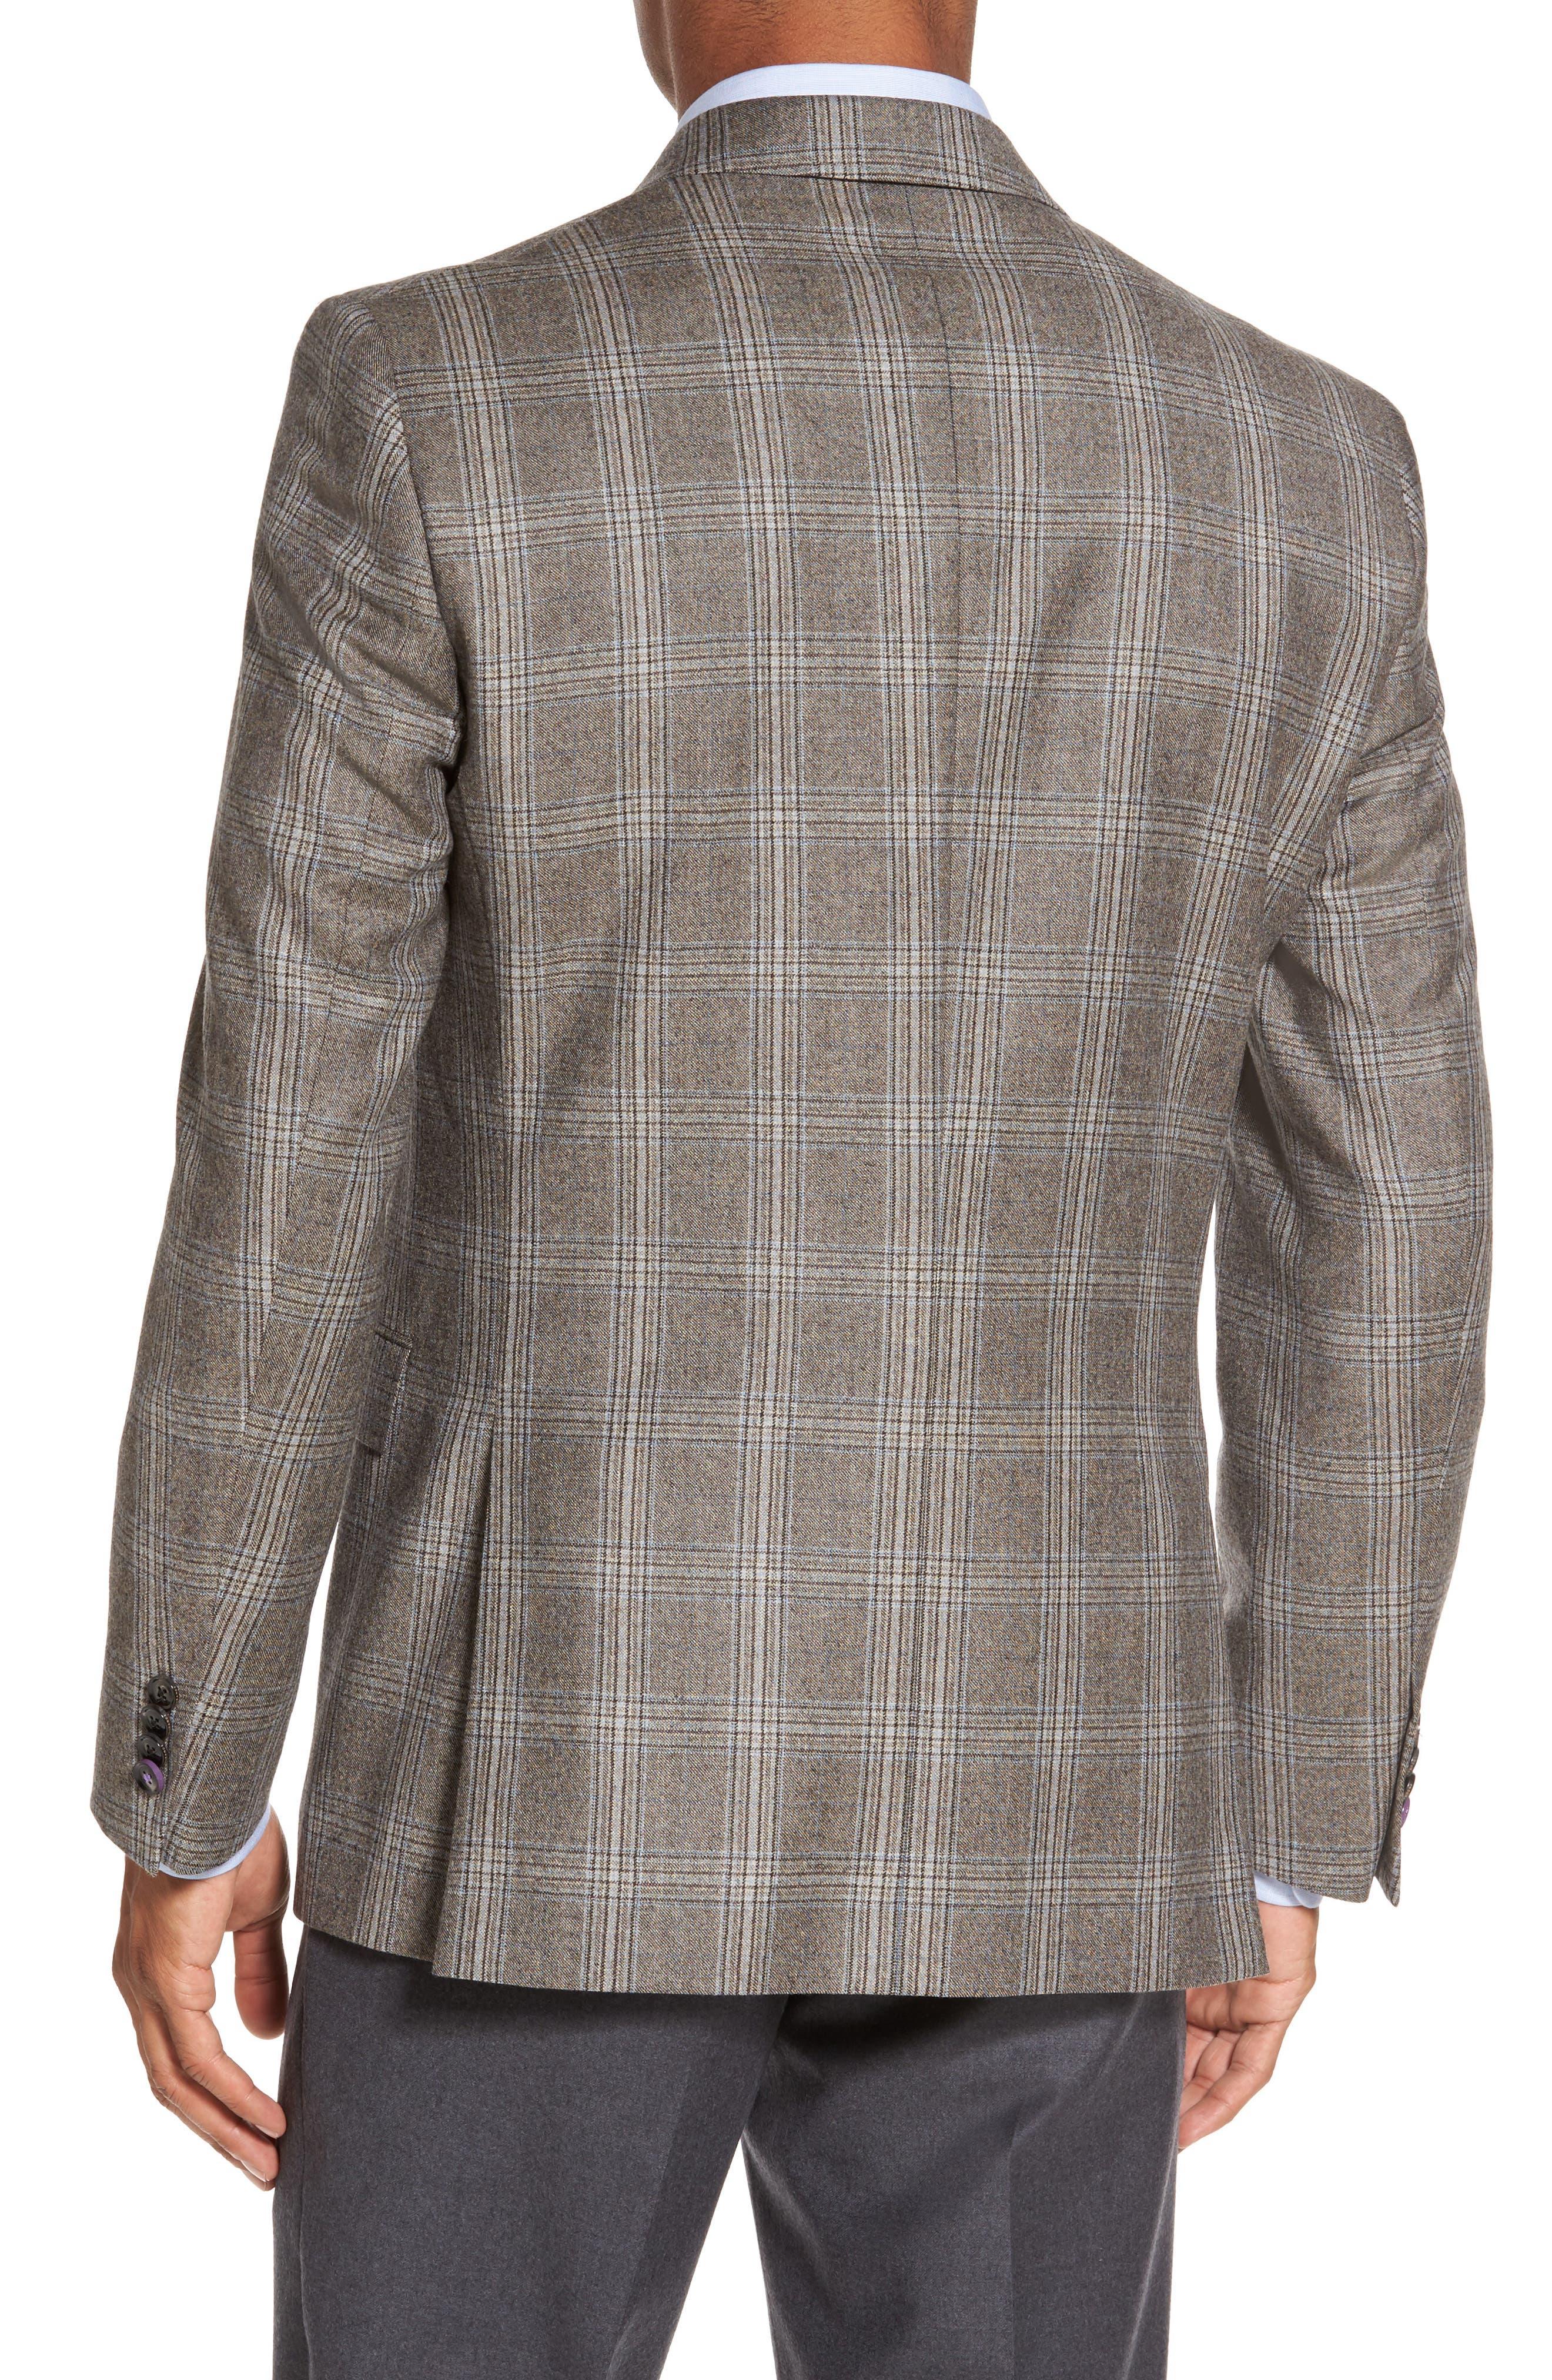 Jay Trim Fit Plaid Wool Sport Coat,                             Alternate thumbnail 2, color,                             230